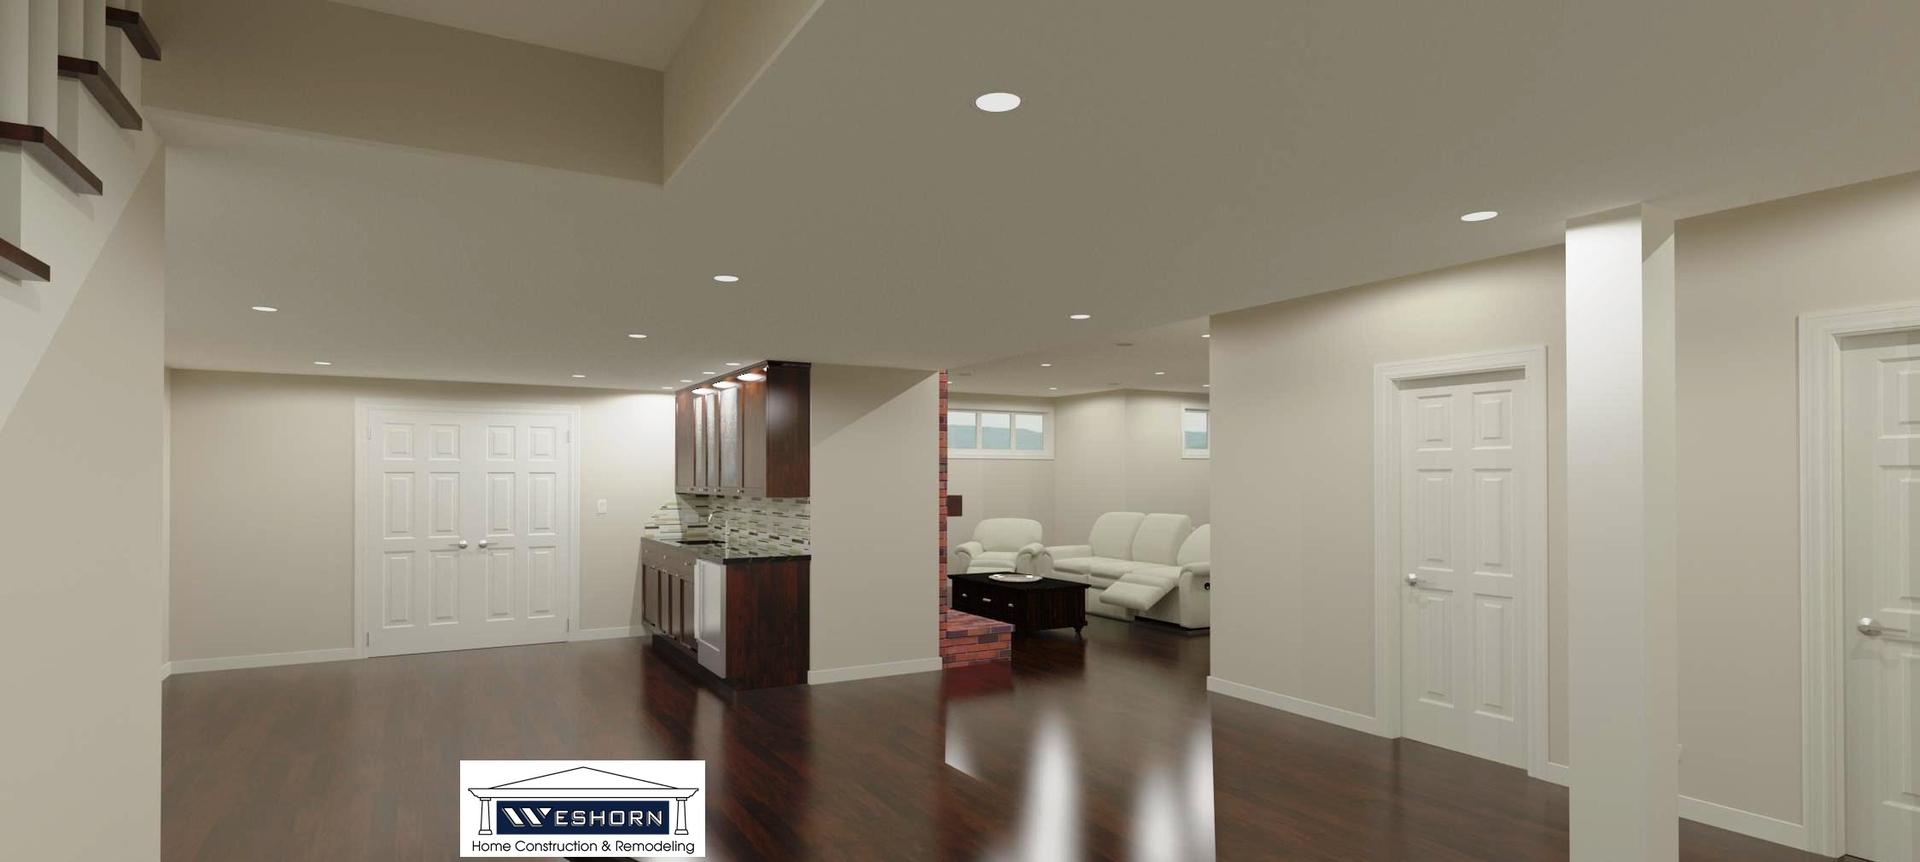 Basement Finishing Remodeling Design Wheaton IL Weshorn Basement - Bathroom remodeling wheaton il